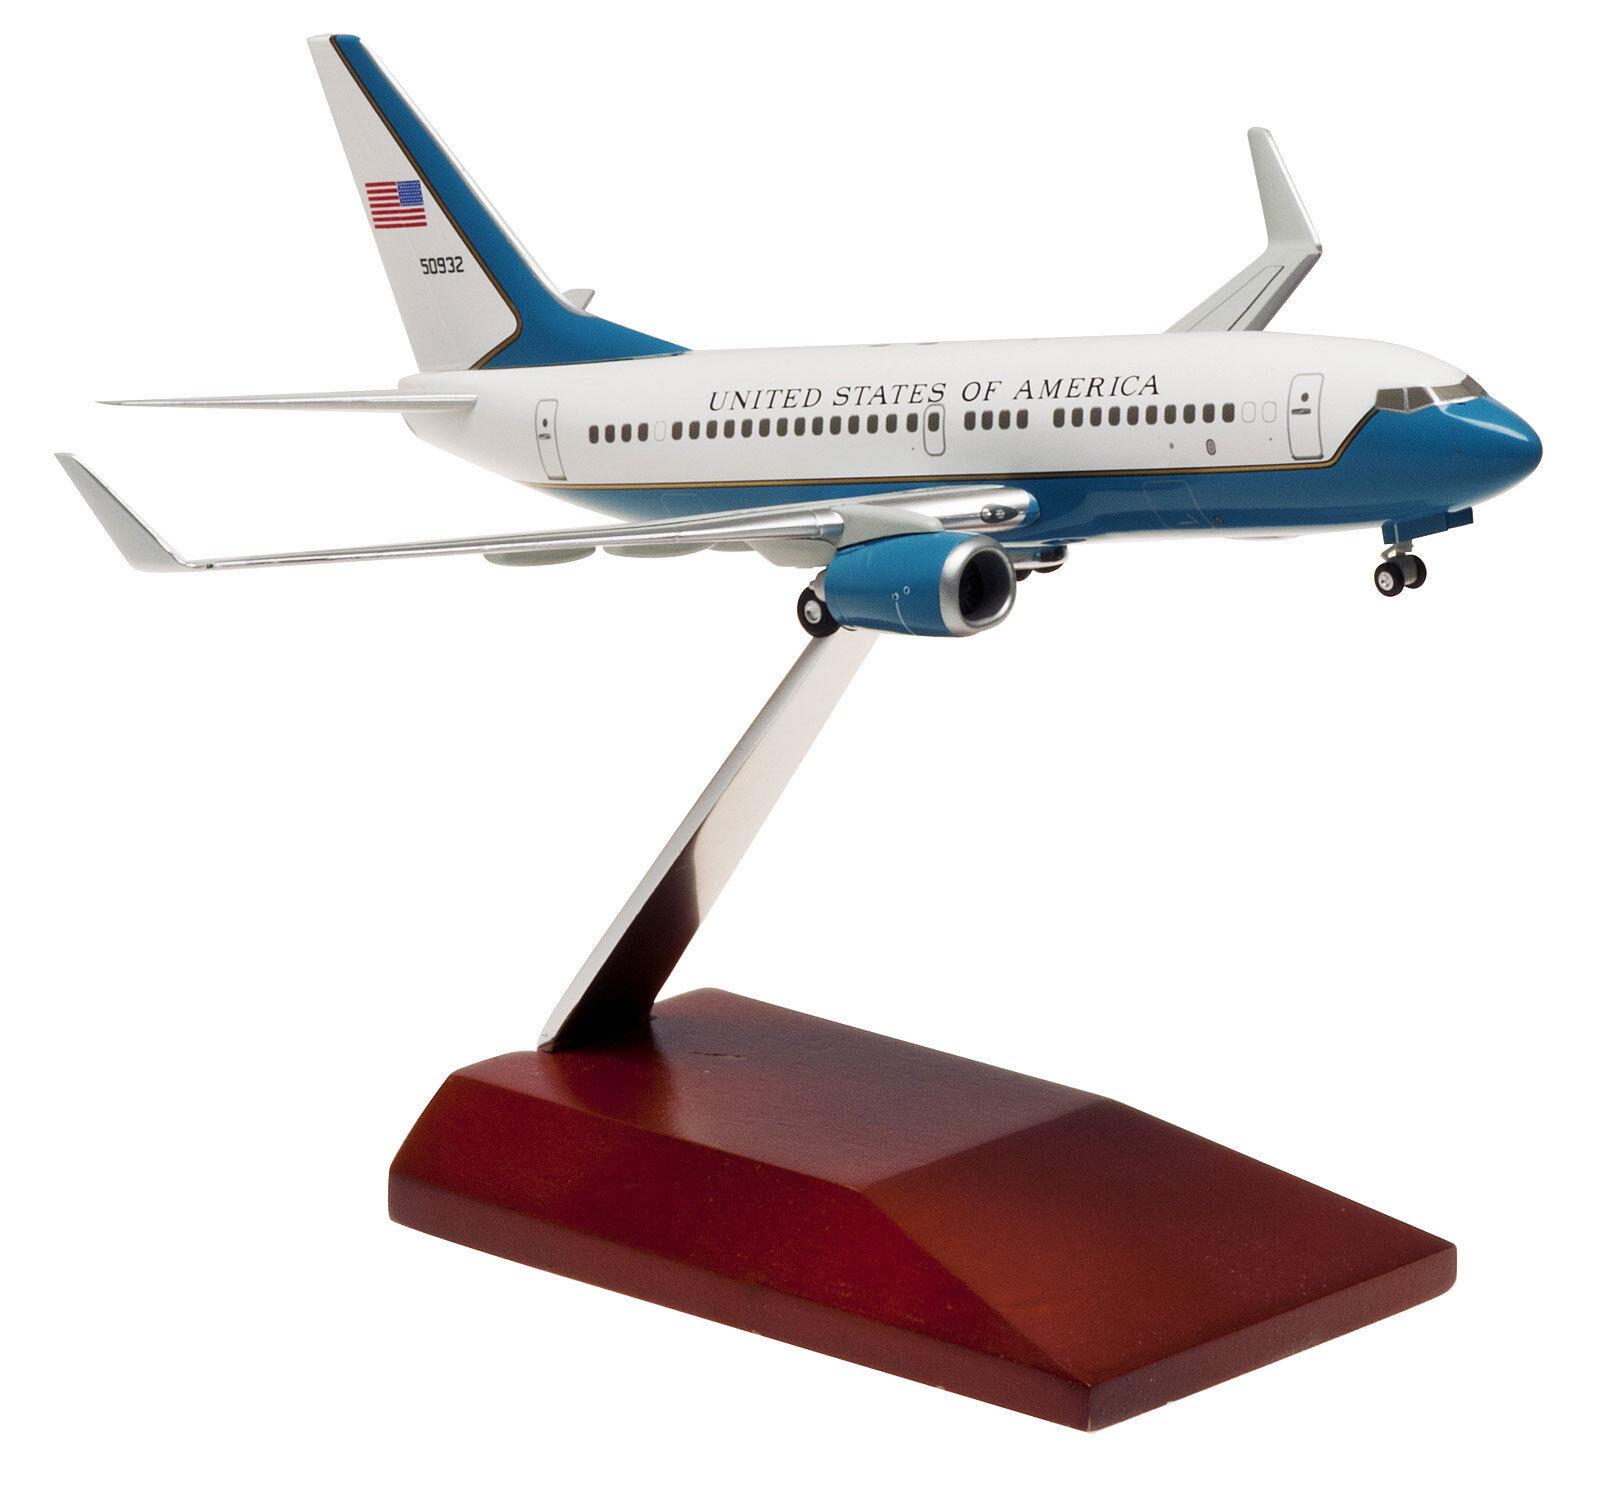 Air Force One-Boeing 737-700 - 1 200 - Hogan Wings 2049-Modèle d'avion b737